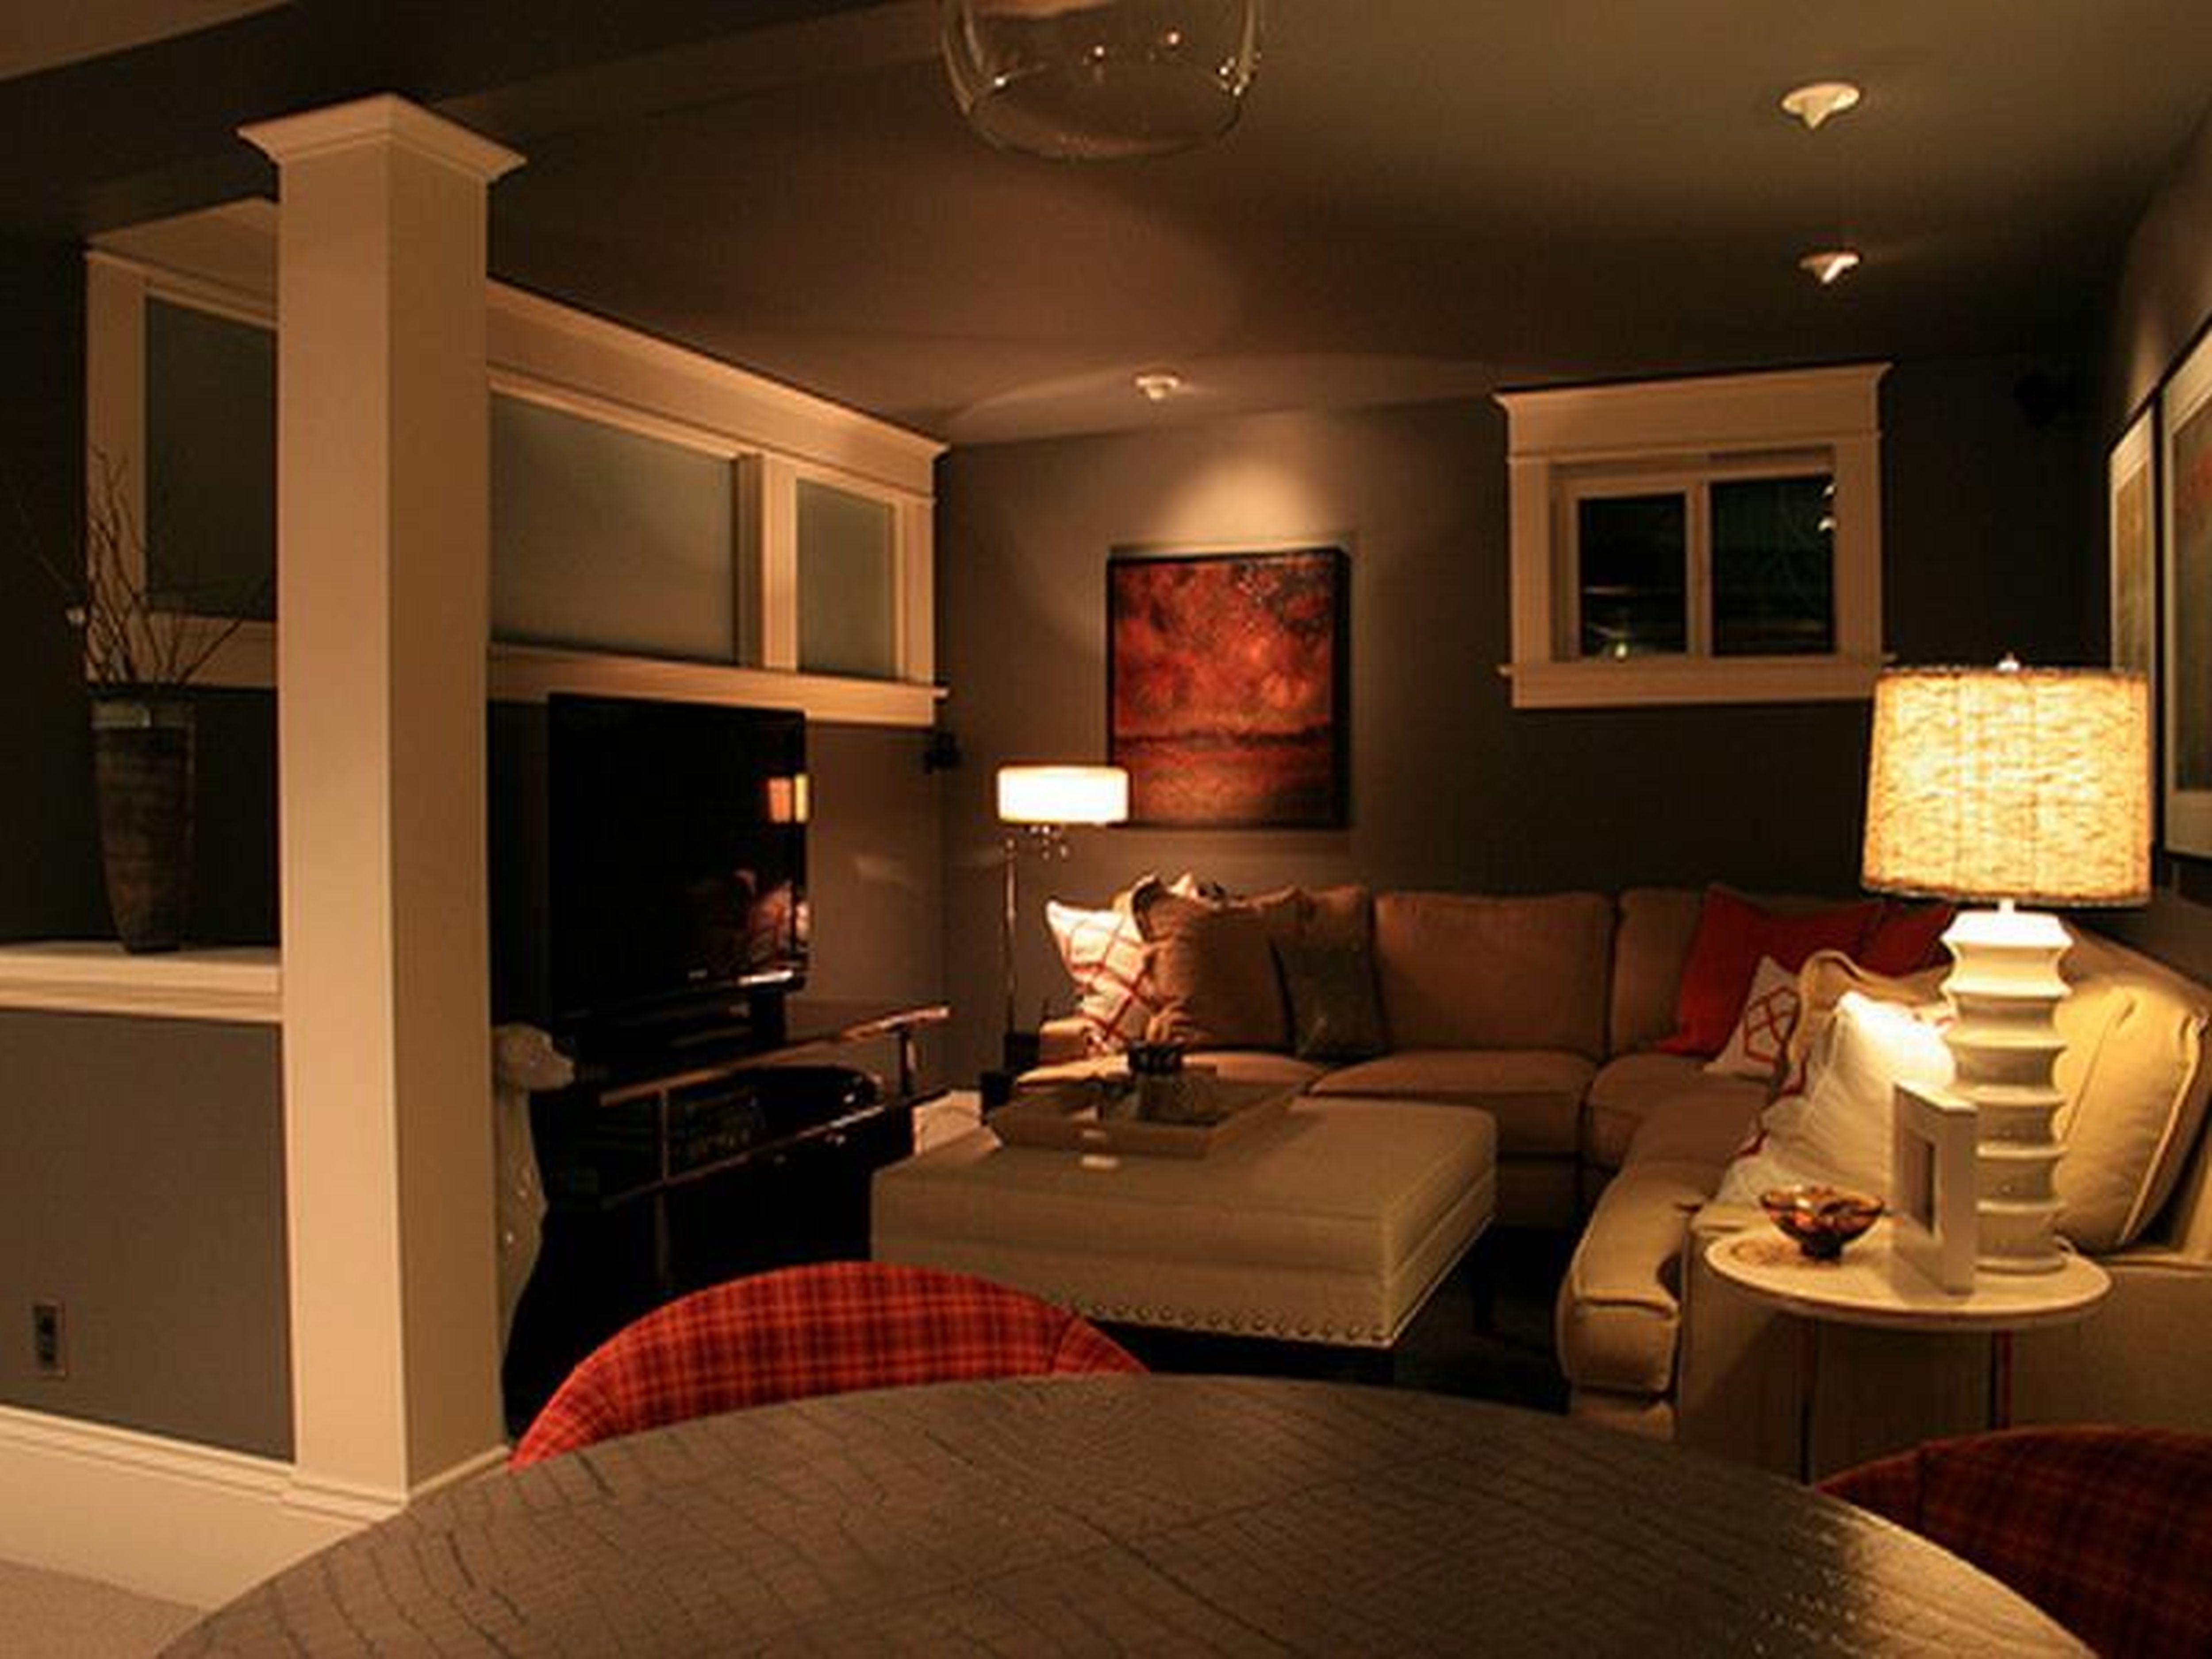 Rustic Basement Family Room Ideas Rustic Basement Family Room Ideas basement living room ideas breakingdesign 5000 X 3750